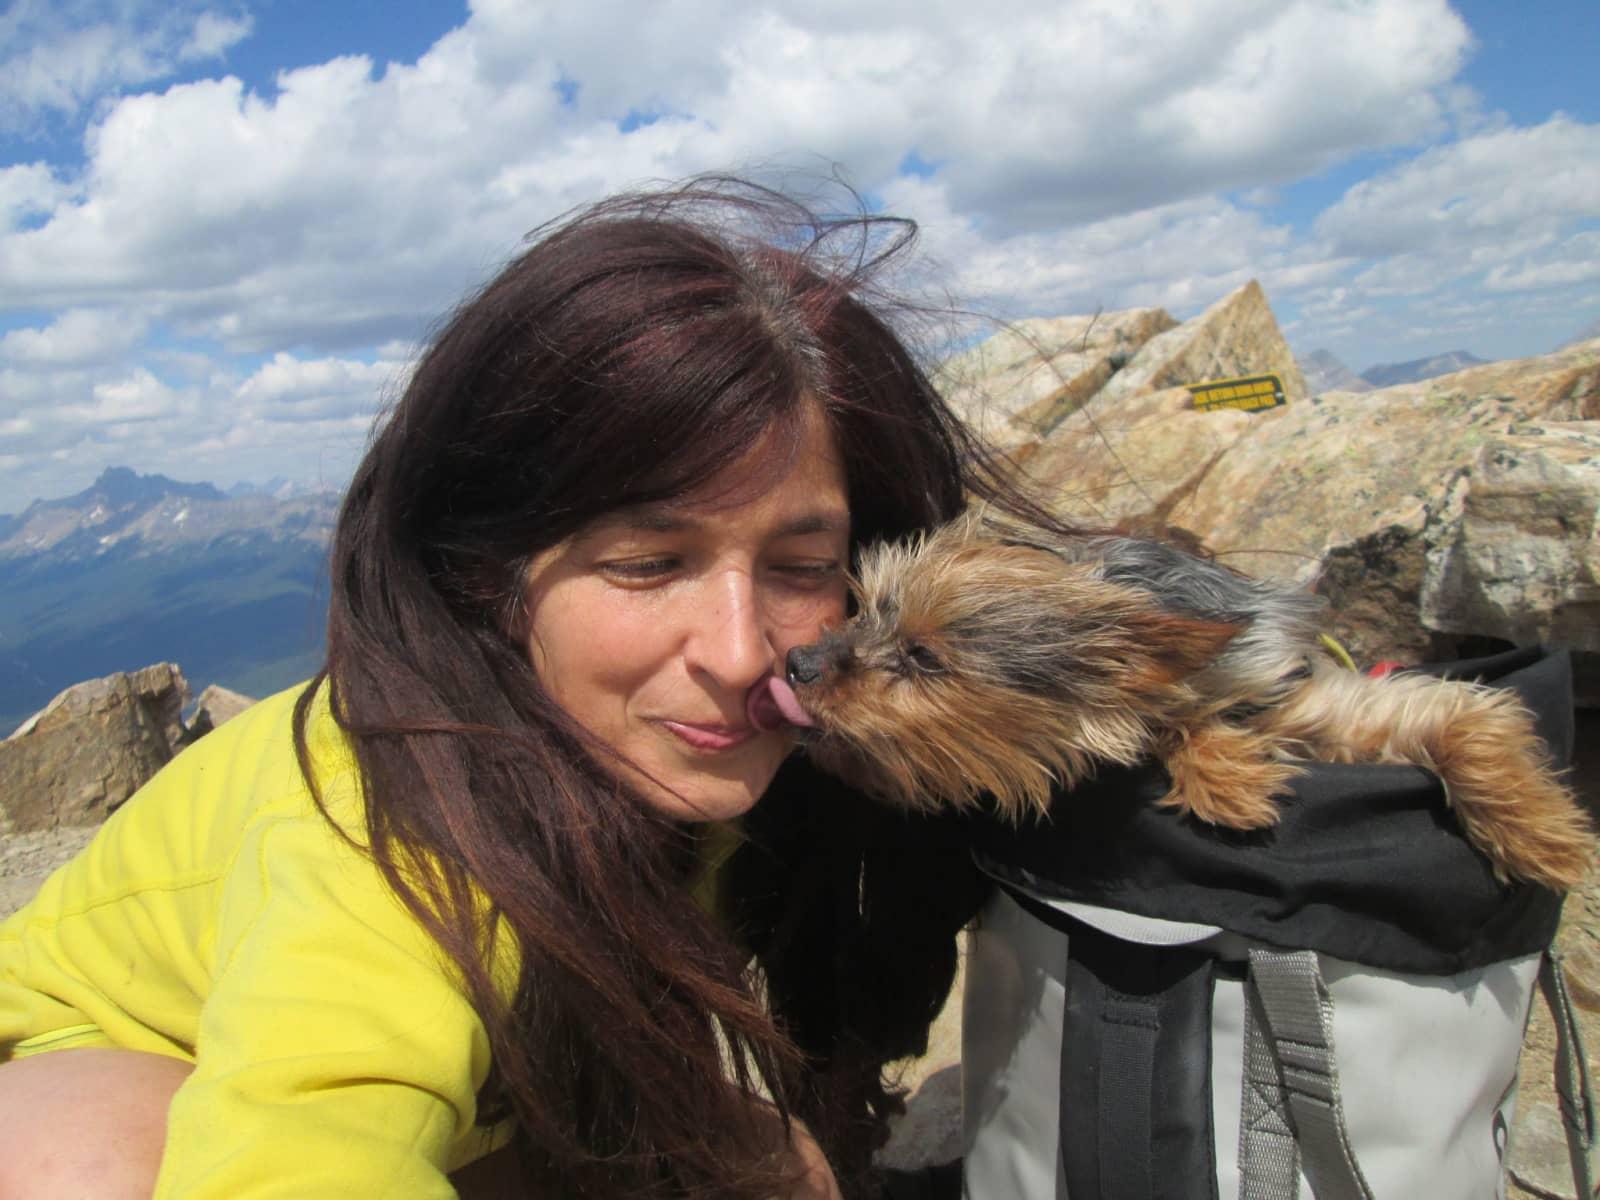 Irina from Calgary, Alberta, Canada